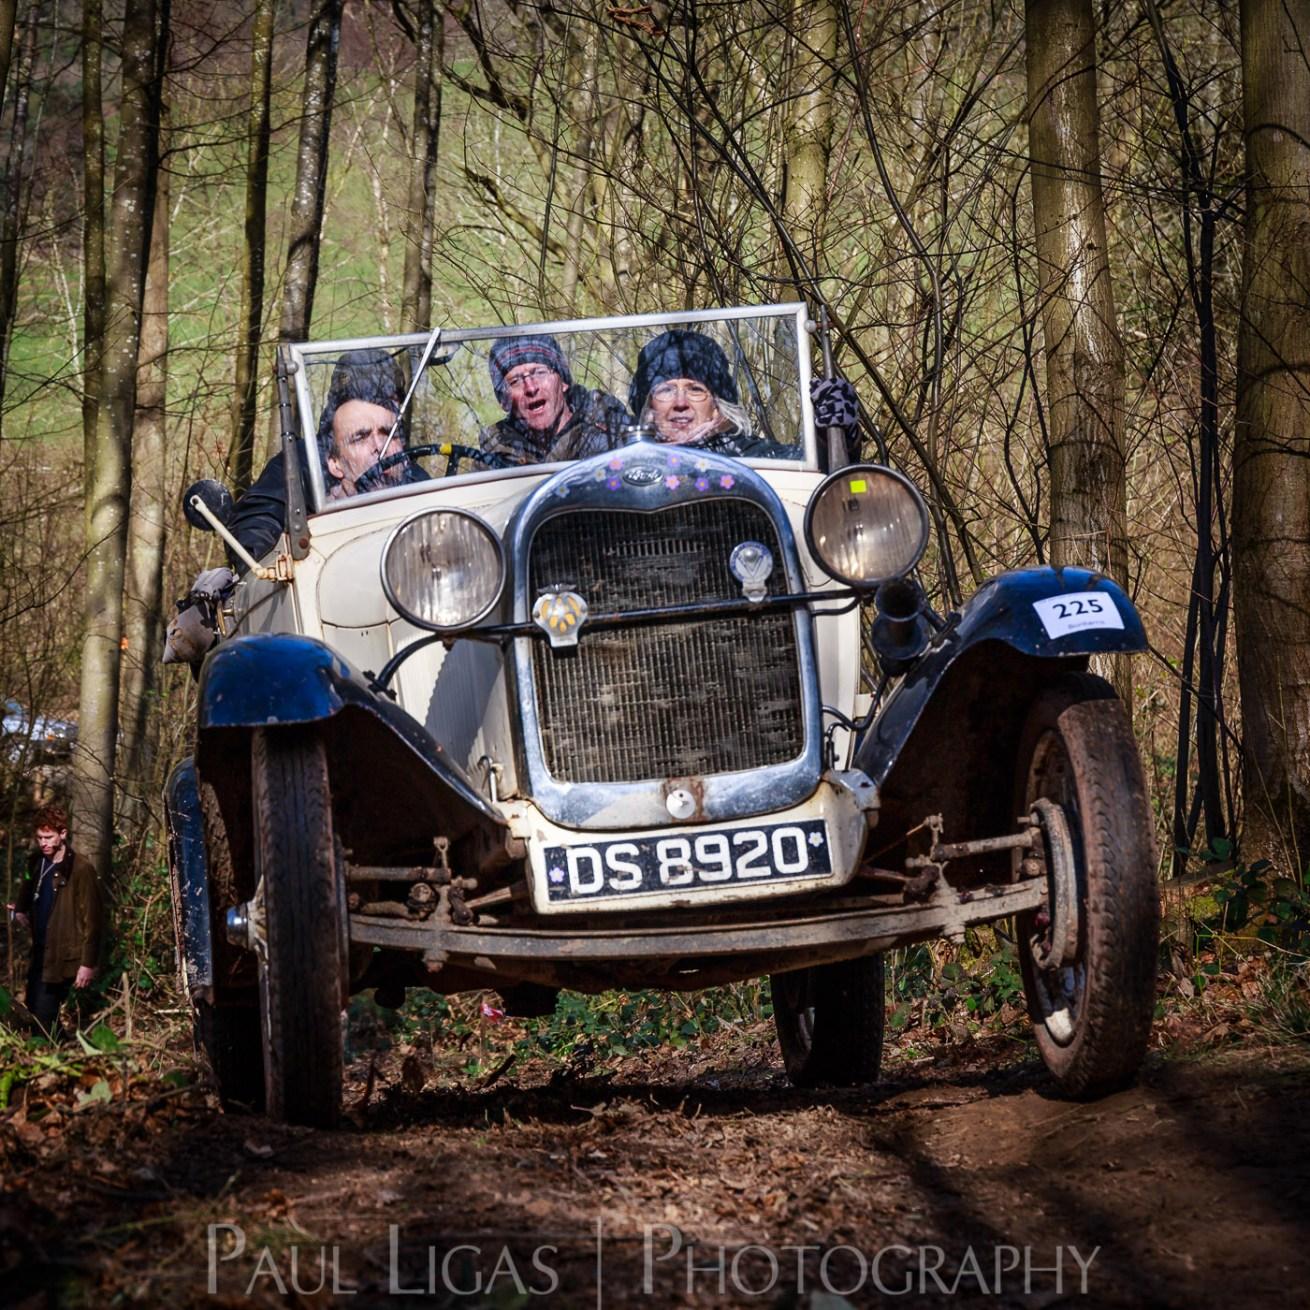 Vintage car hill climbing, Ledbury, Herefordshire event photographer photography 9301